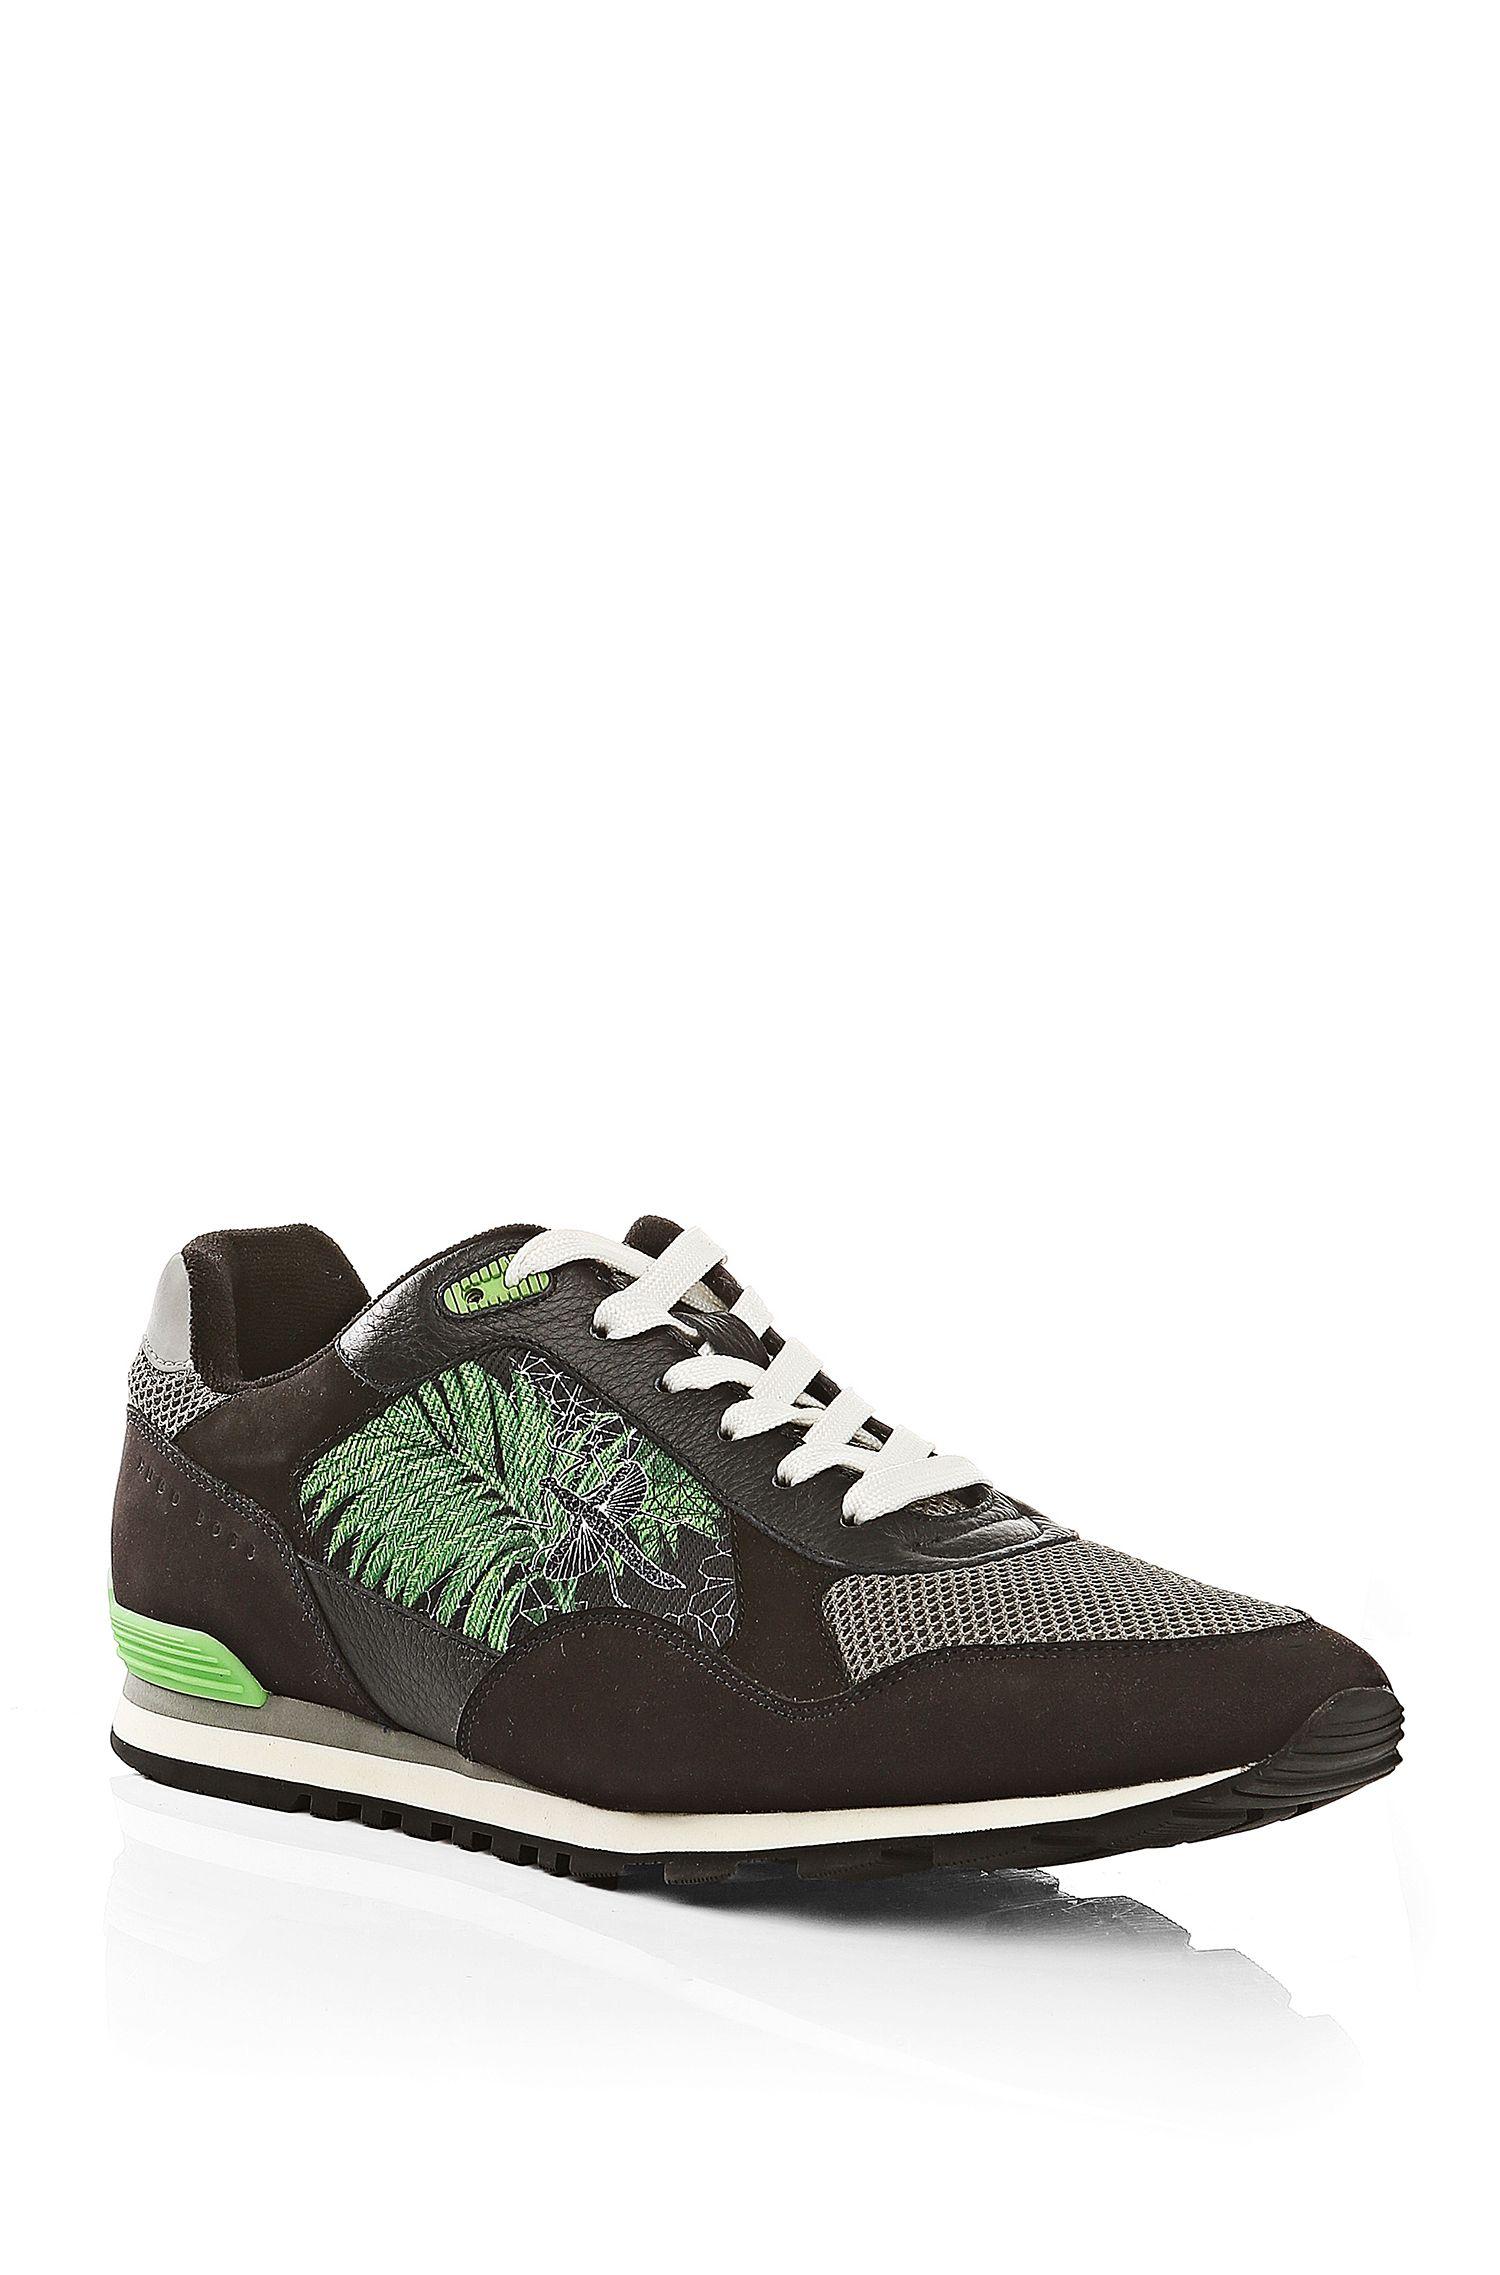 'Runcool Botanic' | Calfskin Botanical Sneakers